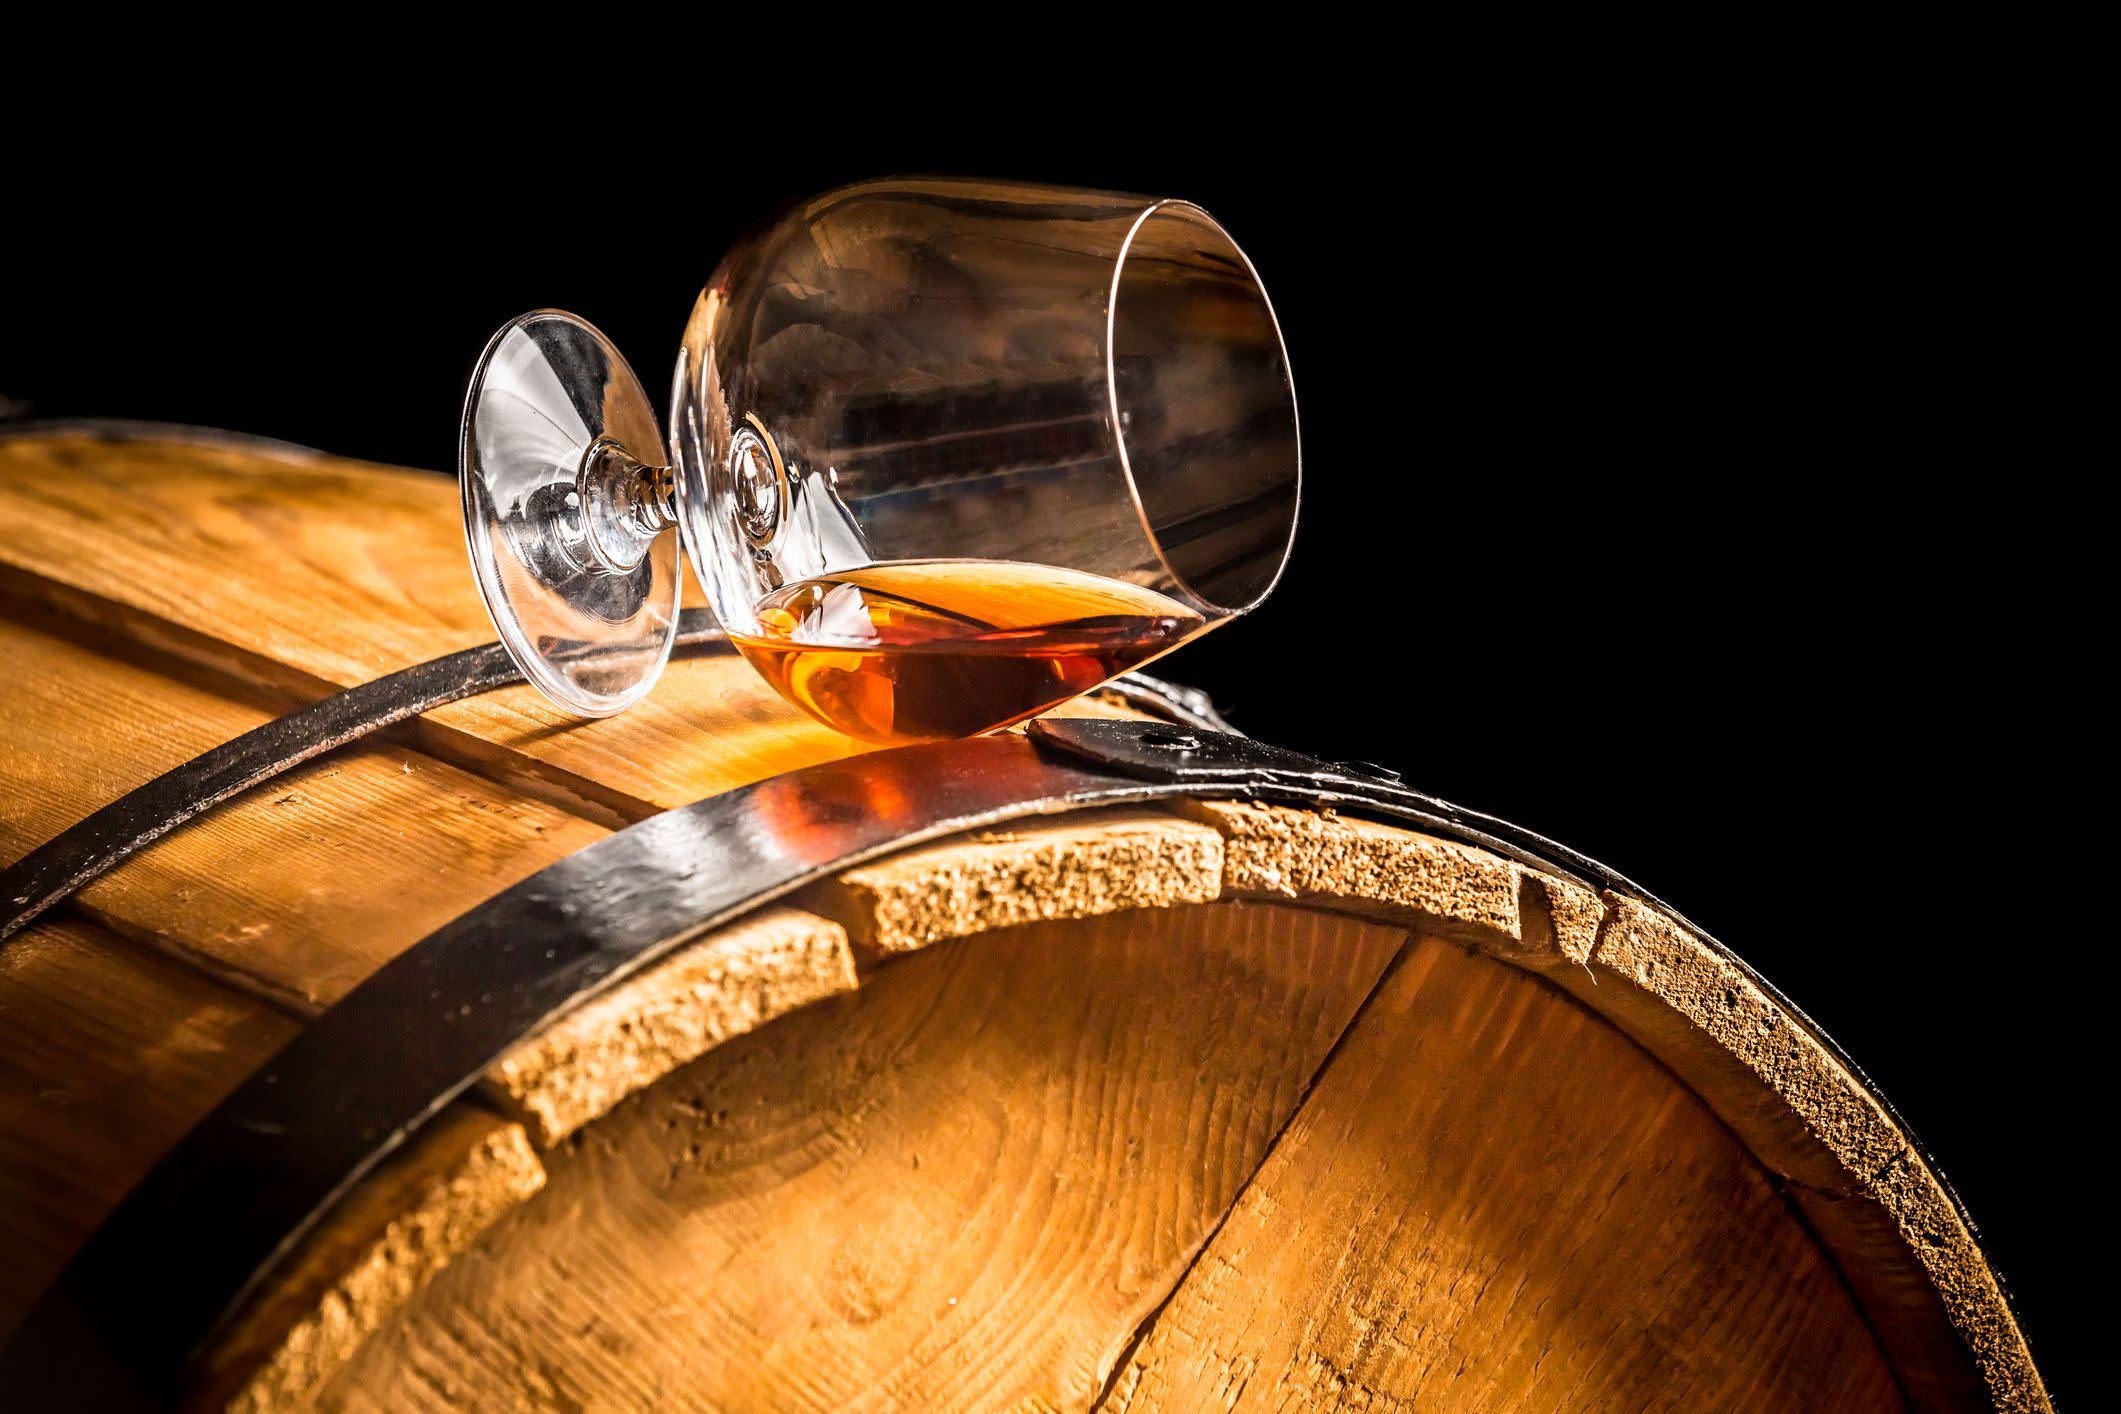 Glass of cognac on the vintage barrel